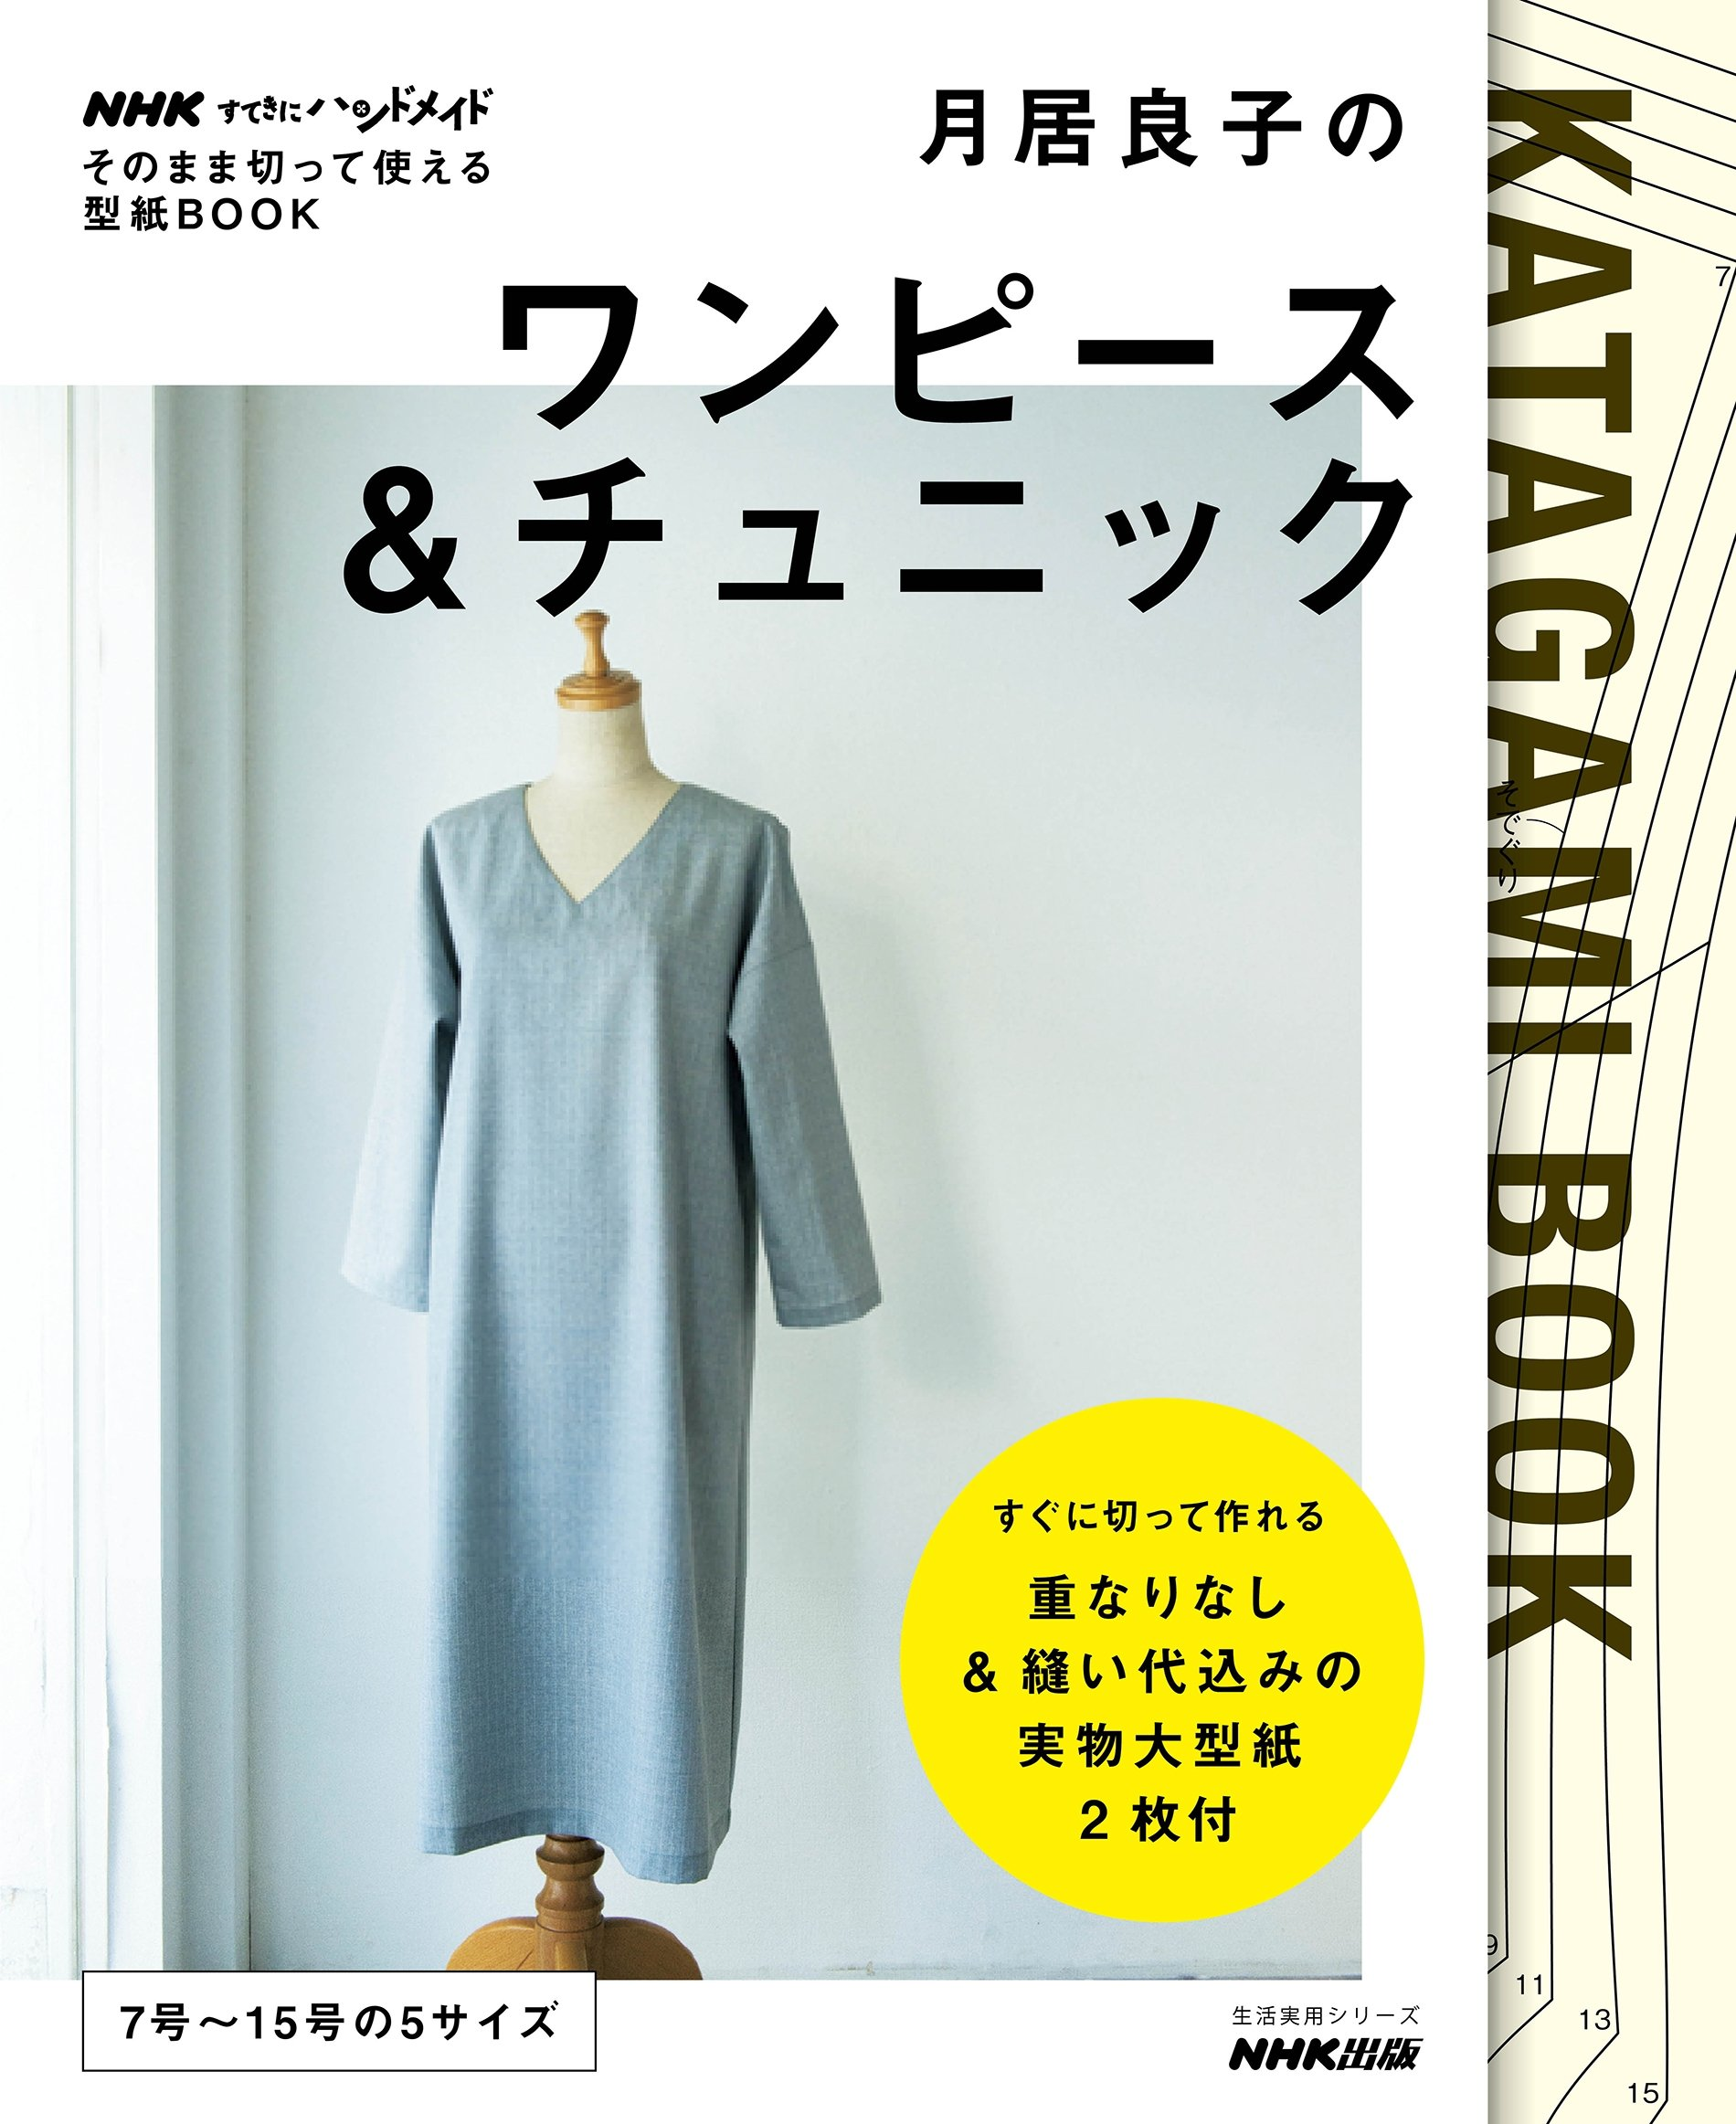 Cute and Slim Wardrobe for Large Size Women by Ryoko Tsukiori Japanese Book